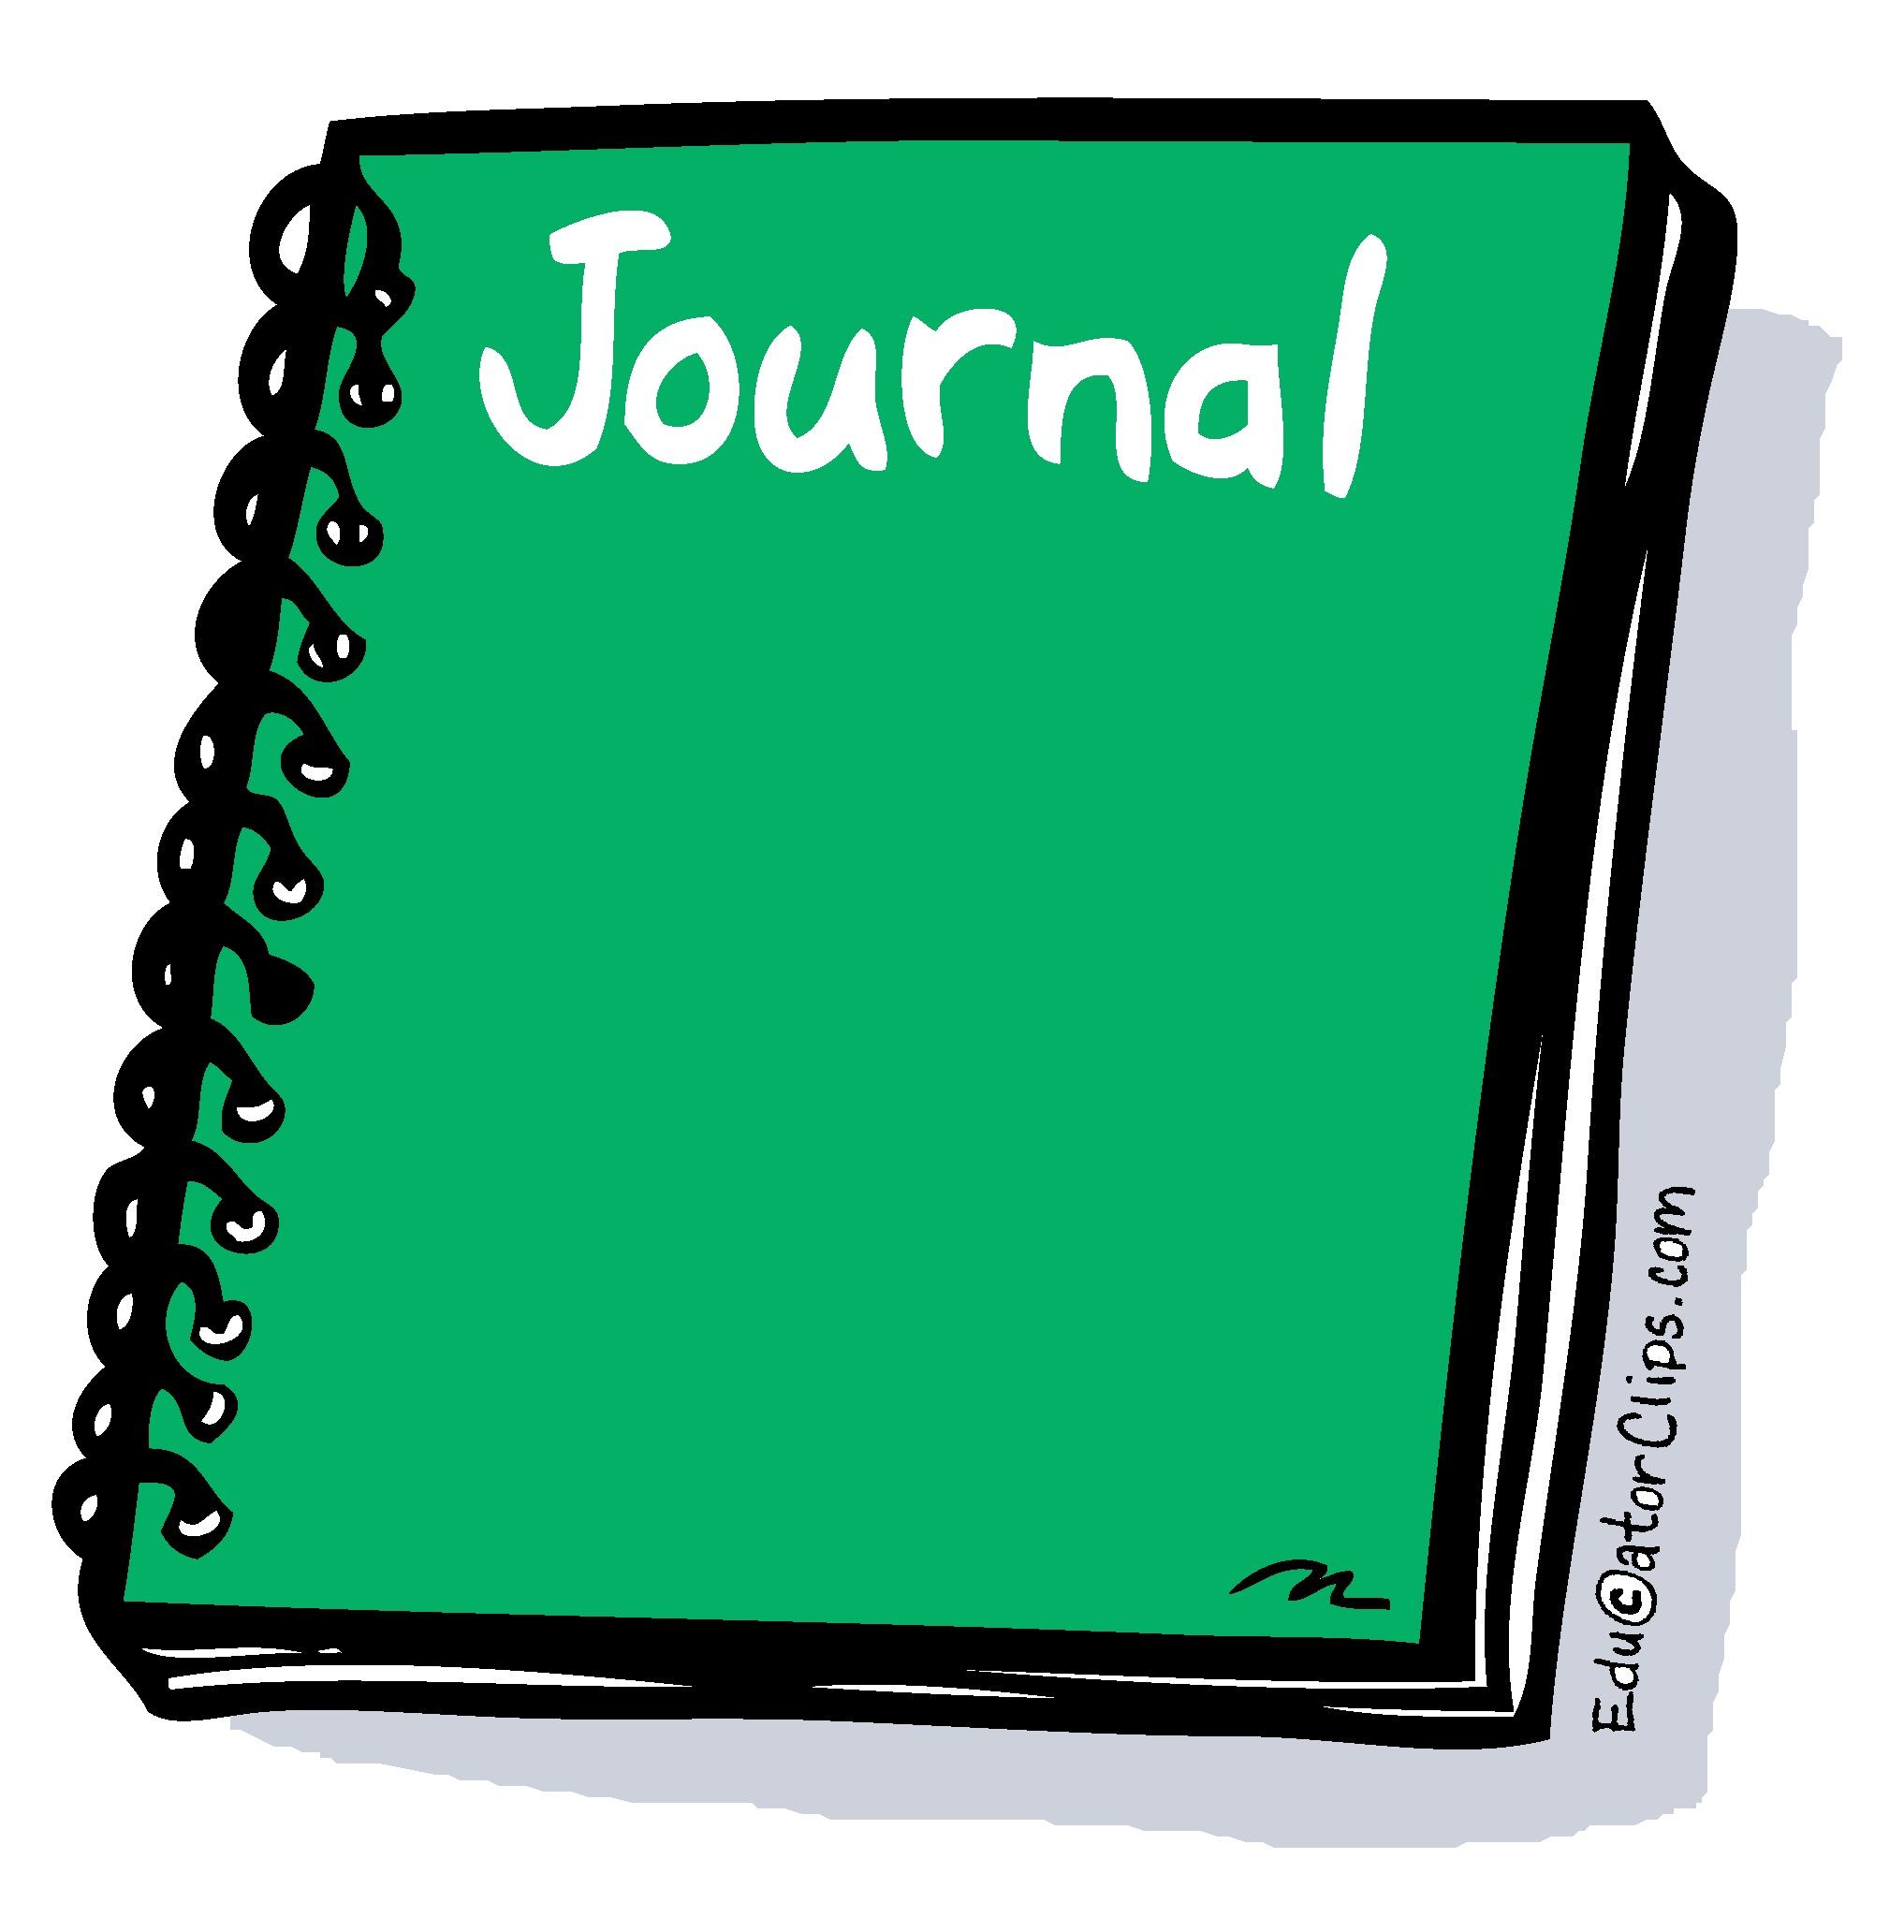 School Journal Clip Art